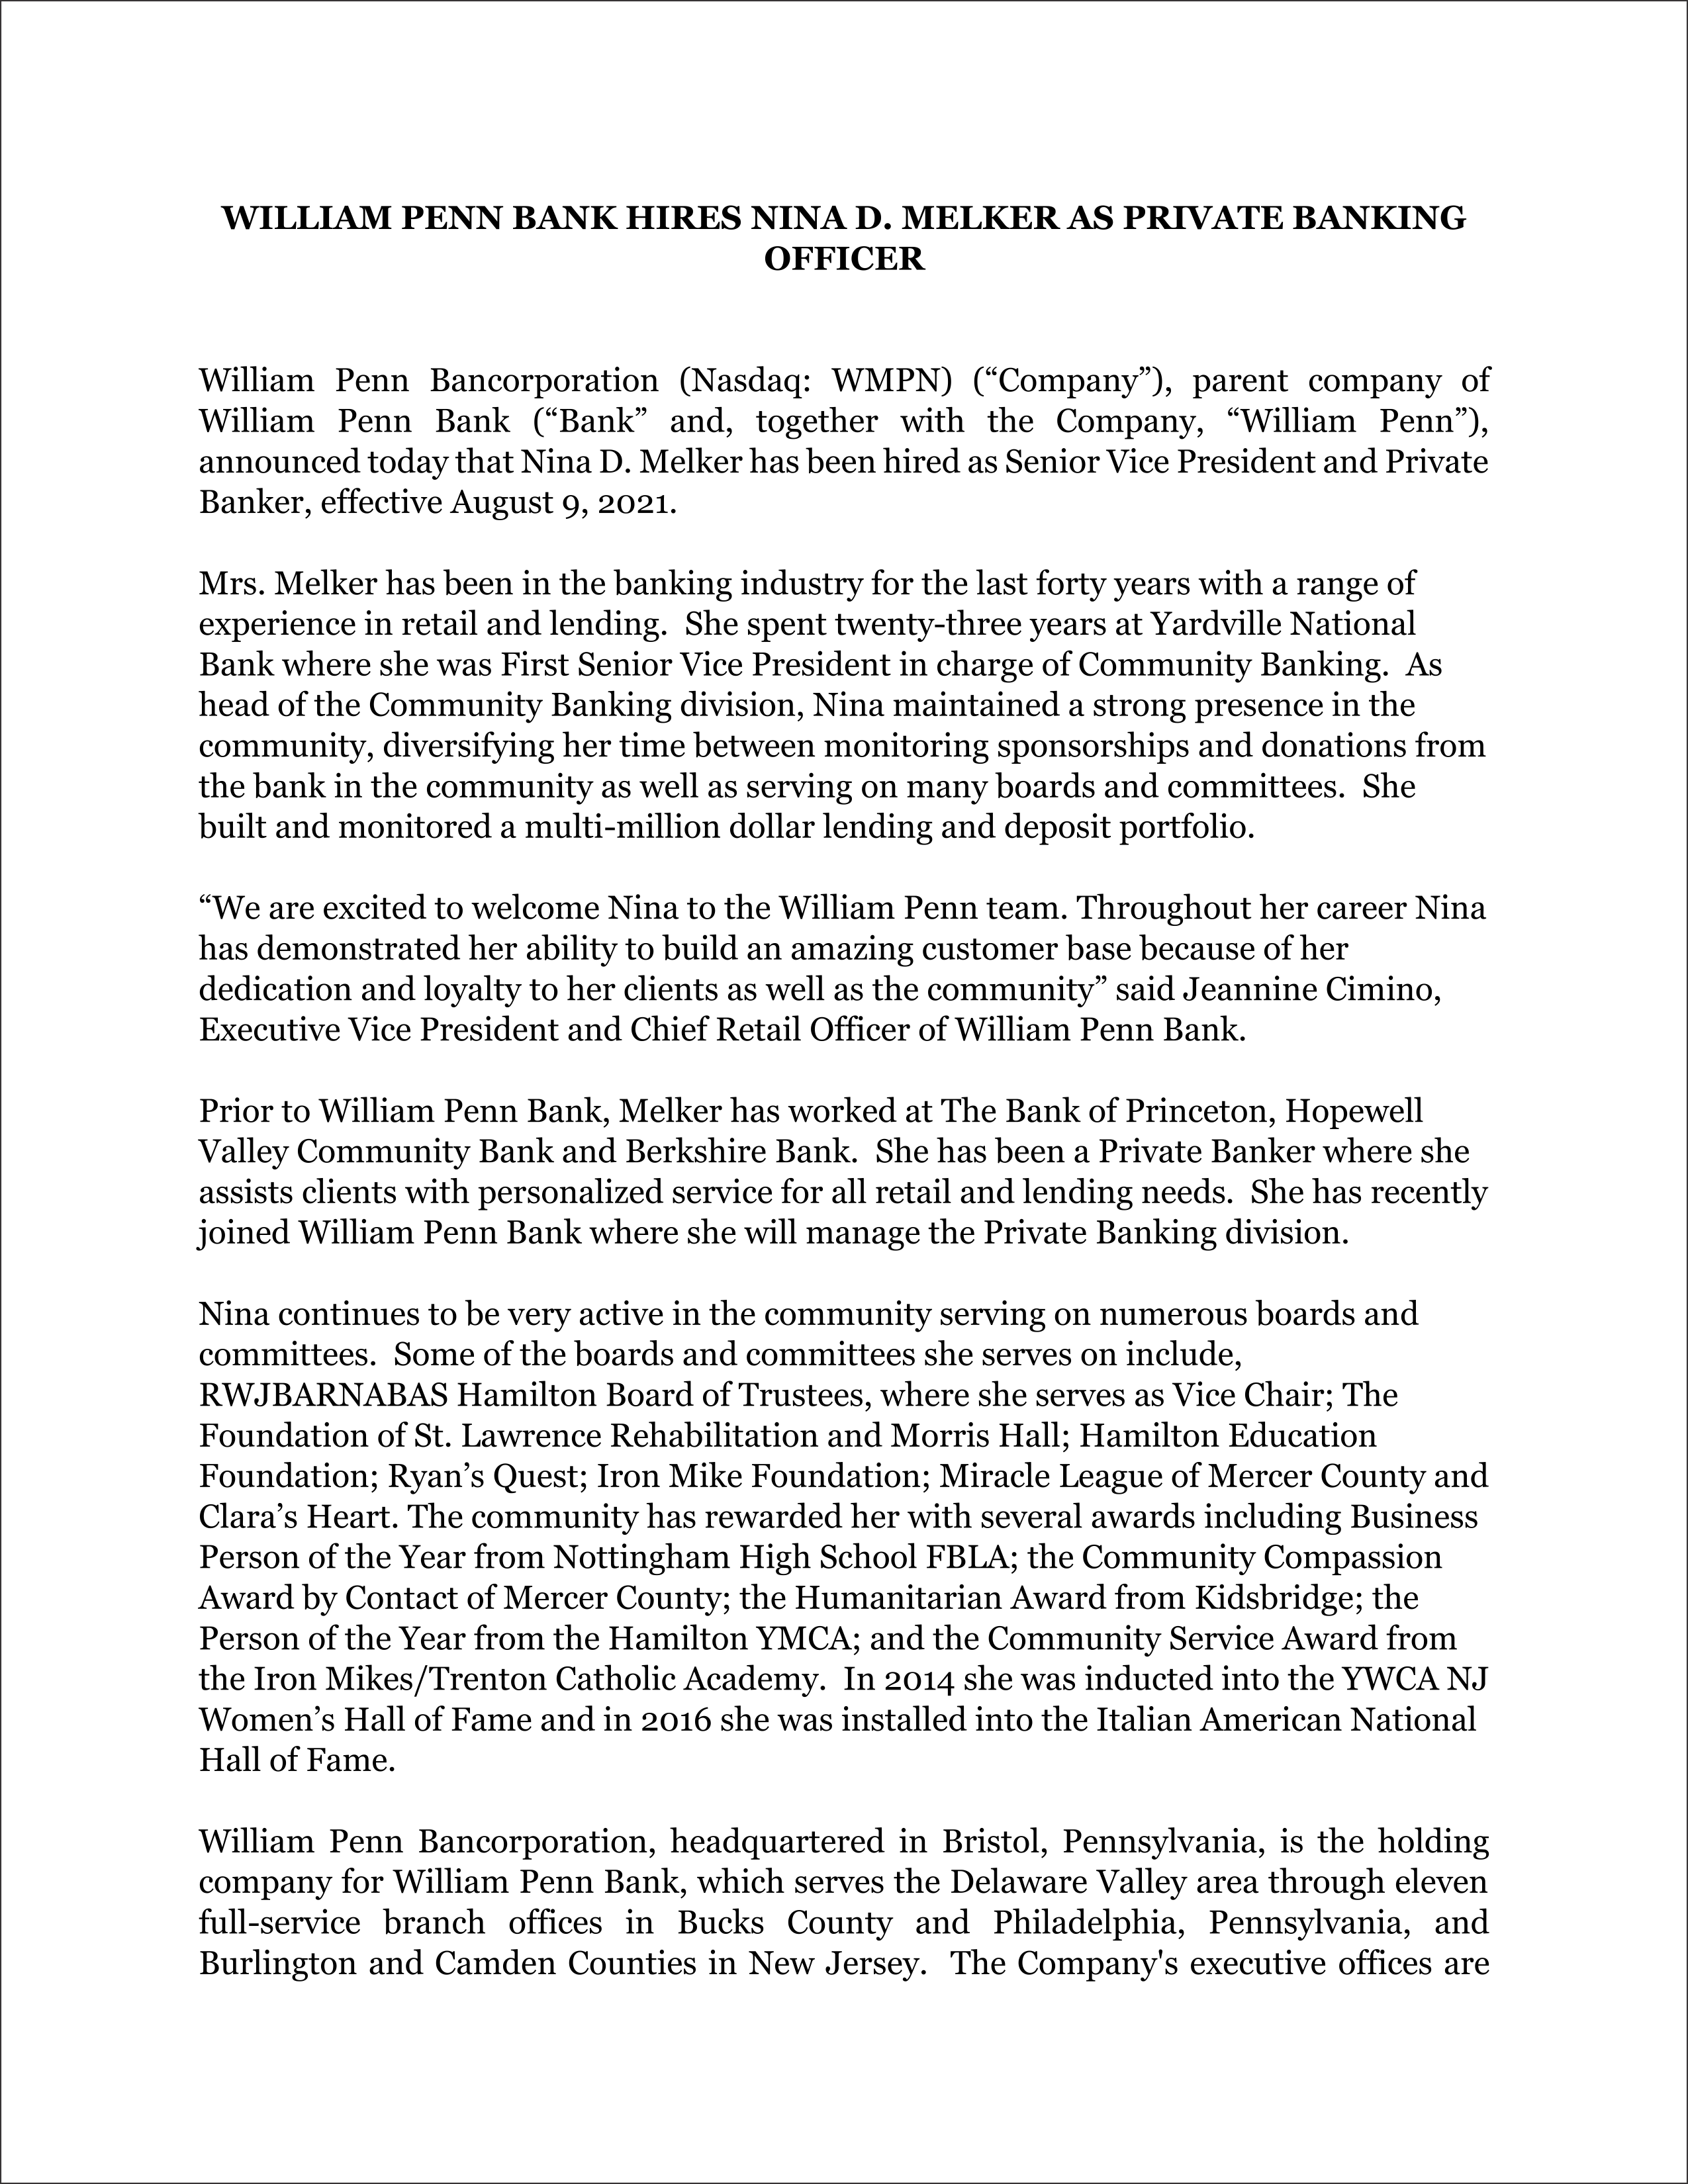 Nina D. Melker - Press Release